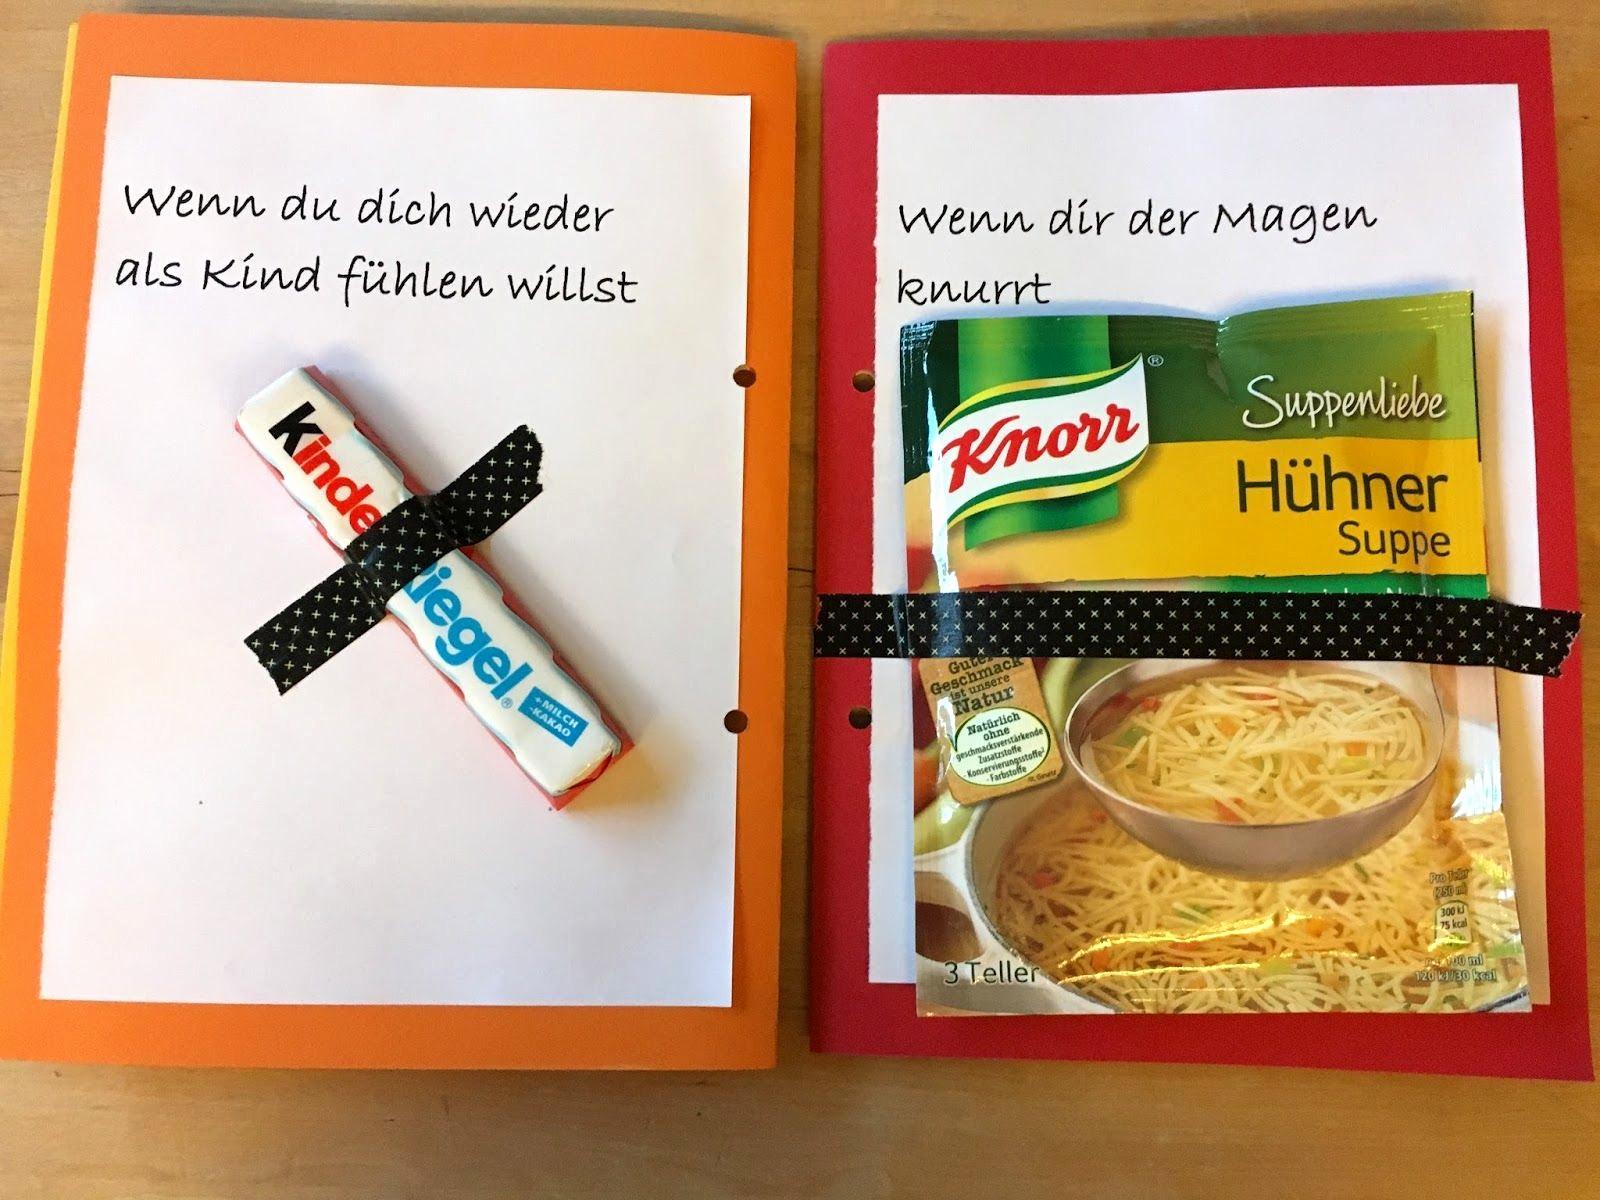 Lustige Geschenke Zum 30. Geburtstag Frau  Geschenke Zum 30 Geburtstag Frau Basteln – Wohn design